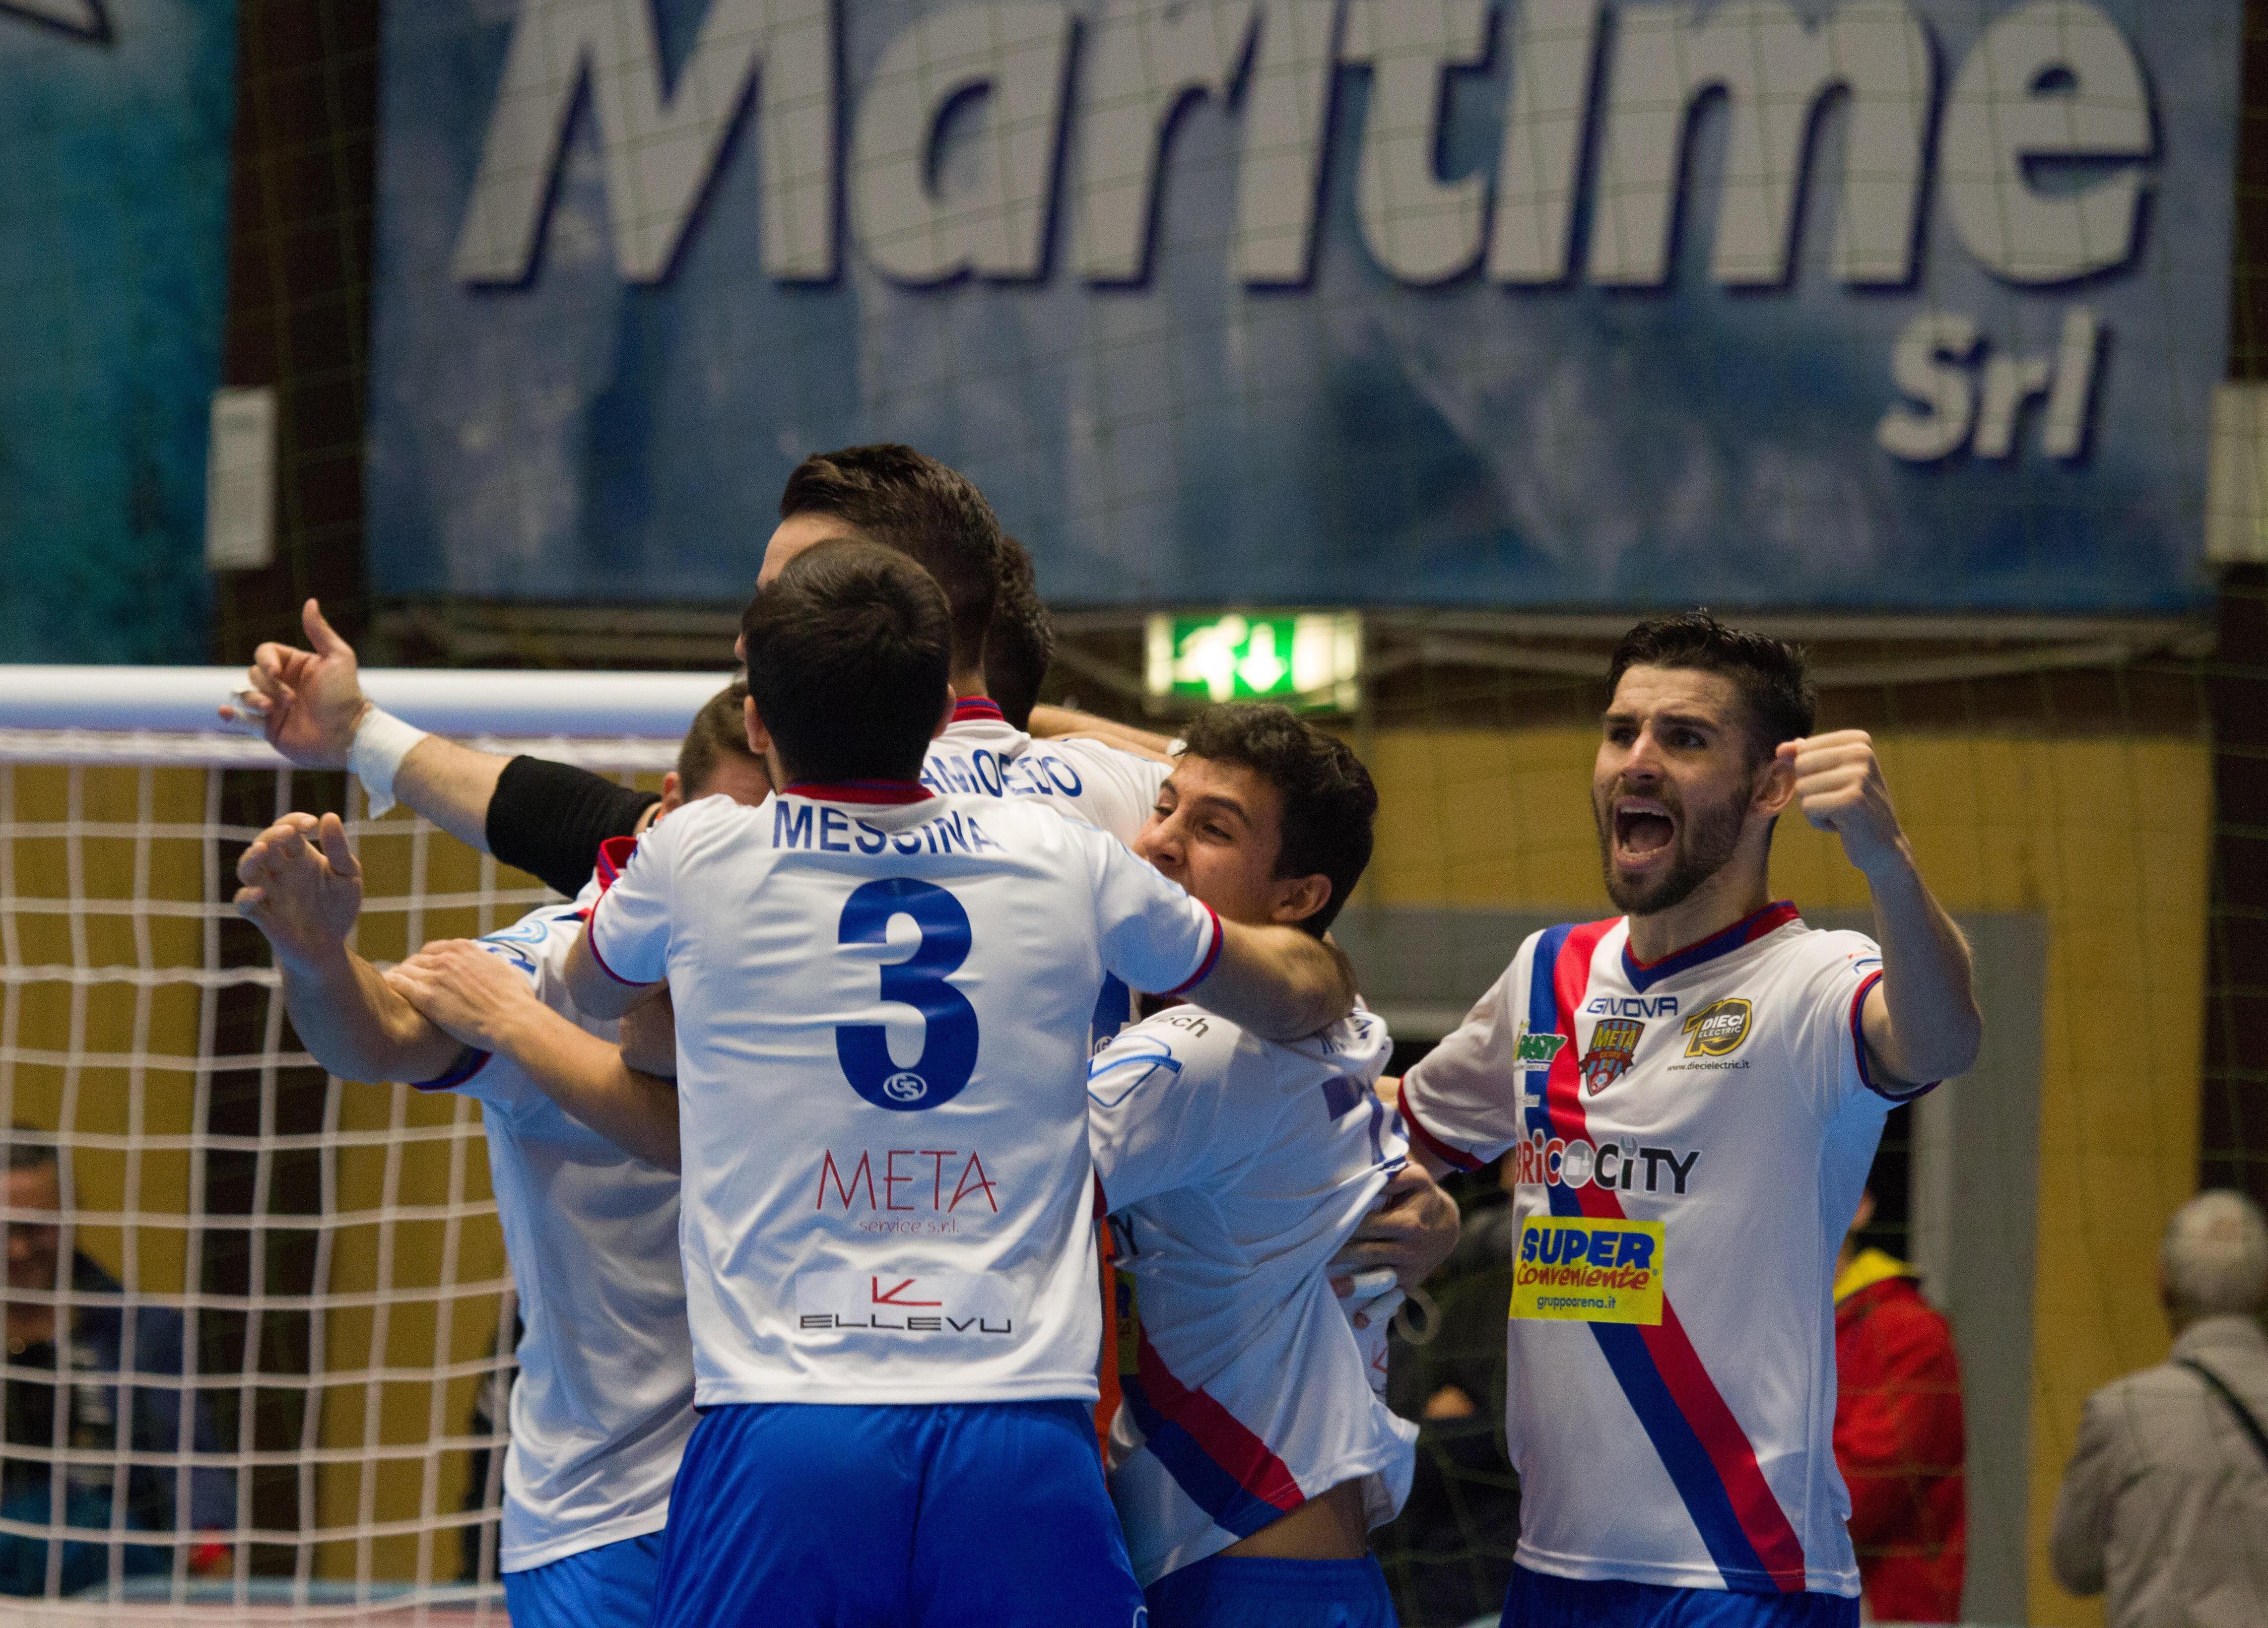 Maritime-Meta Catania Bricocity 0-1, decide Constantino.